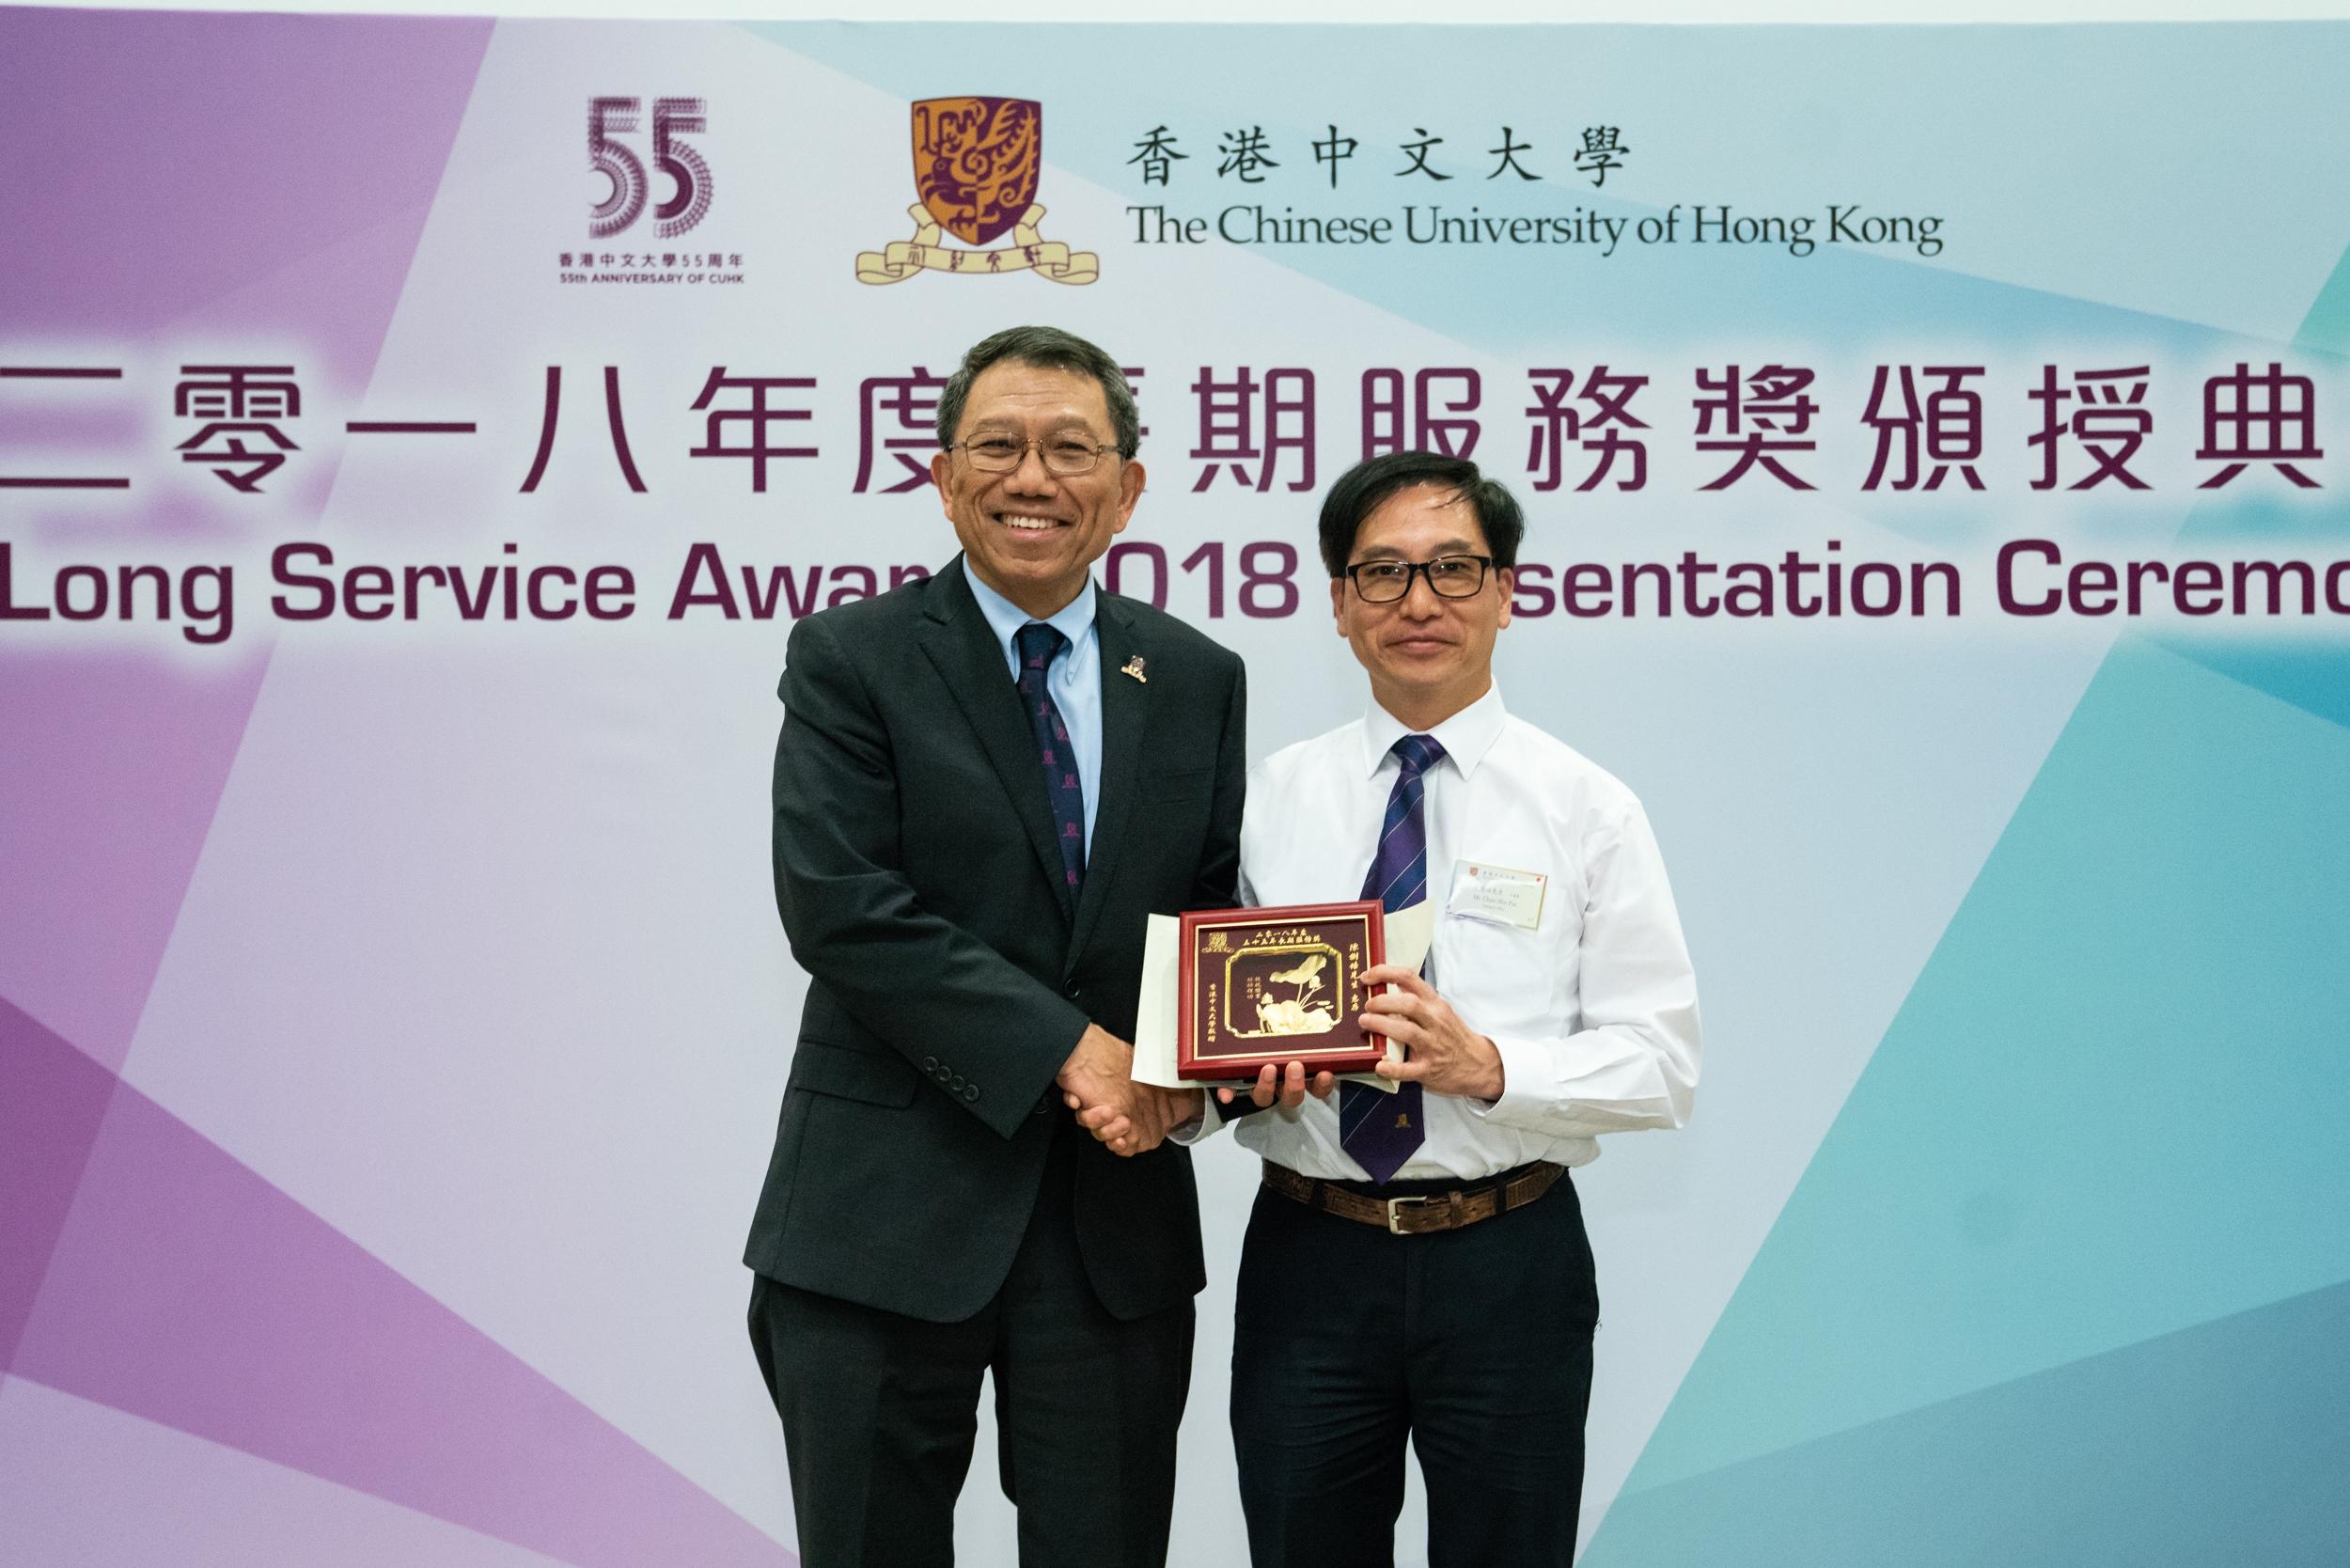 Mr. Chan Shu-pui receives the 35-year long service award.